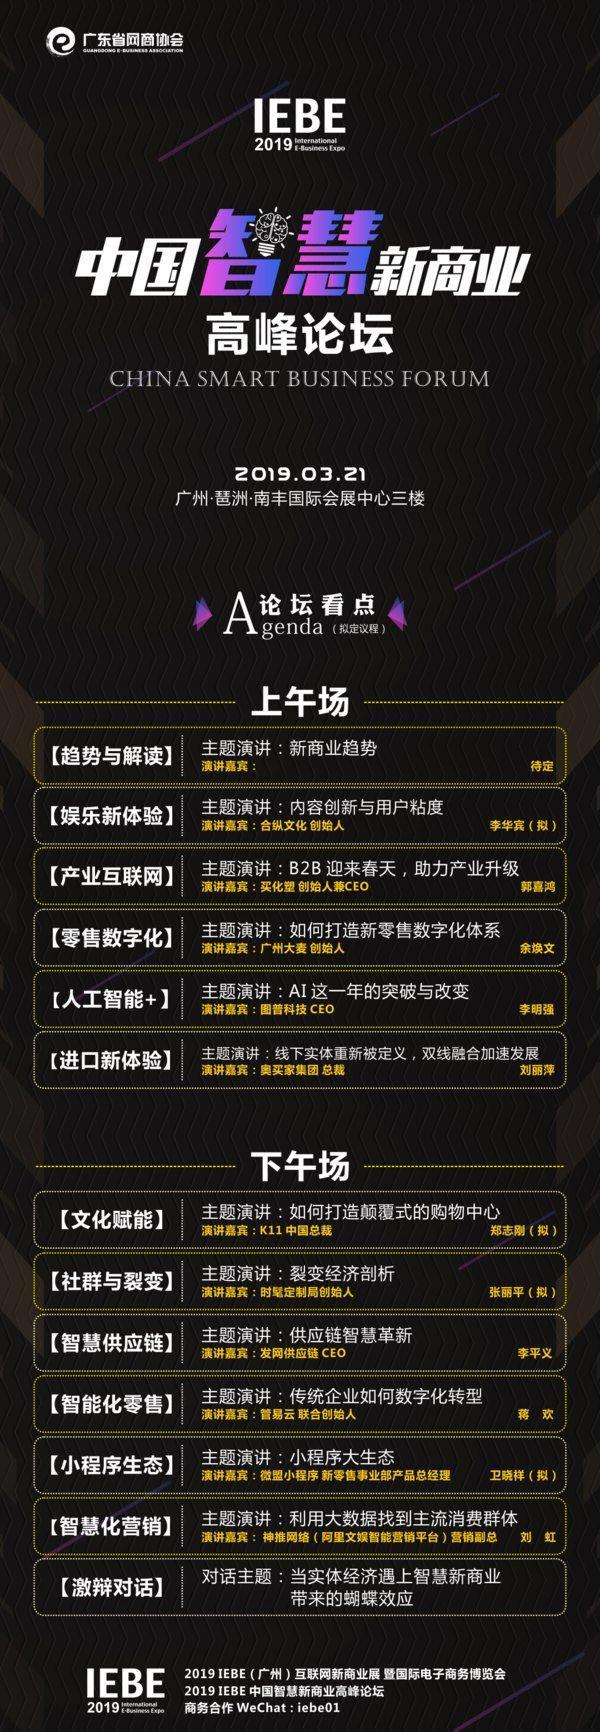 2019 IEBE中国智慧新商业高峰论坛